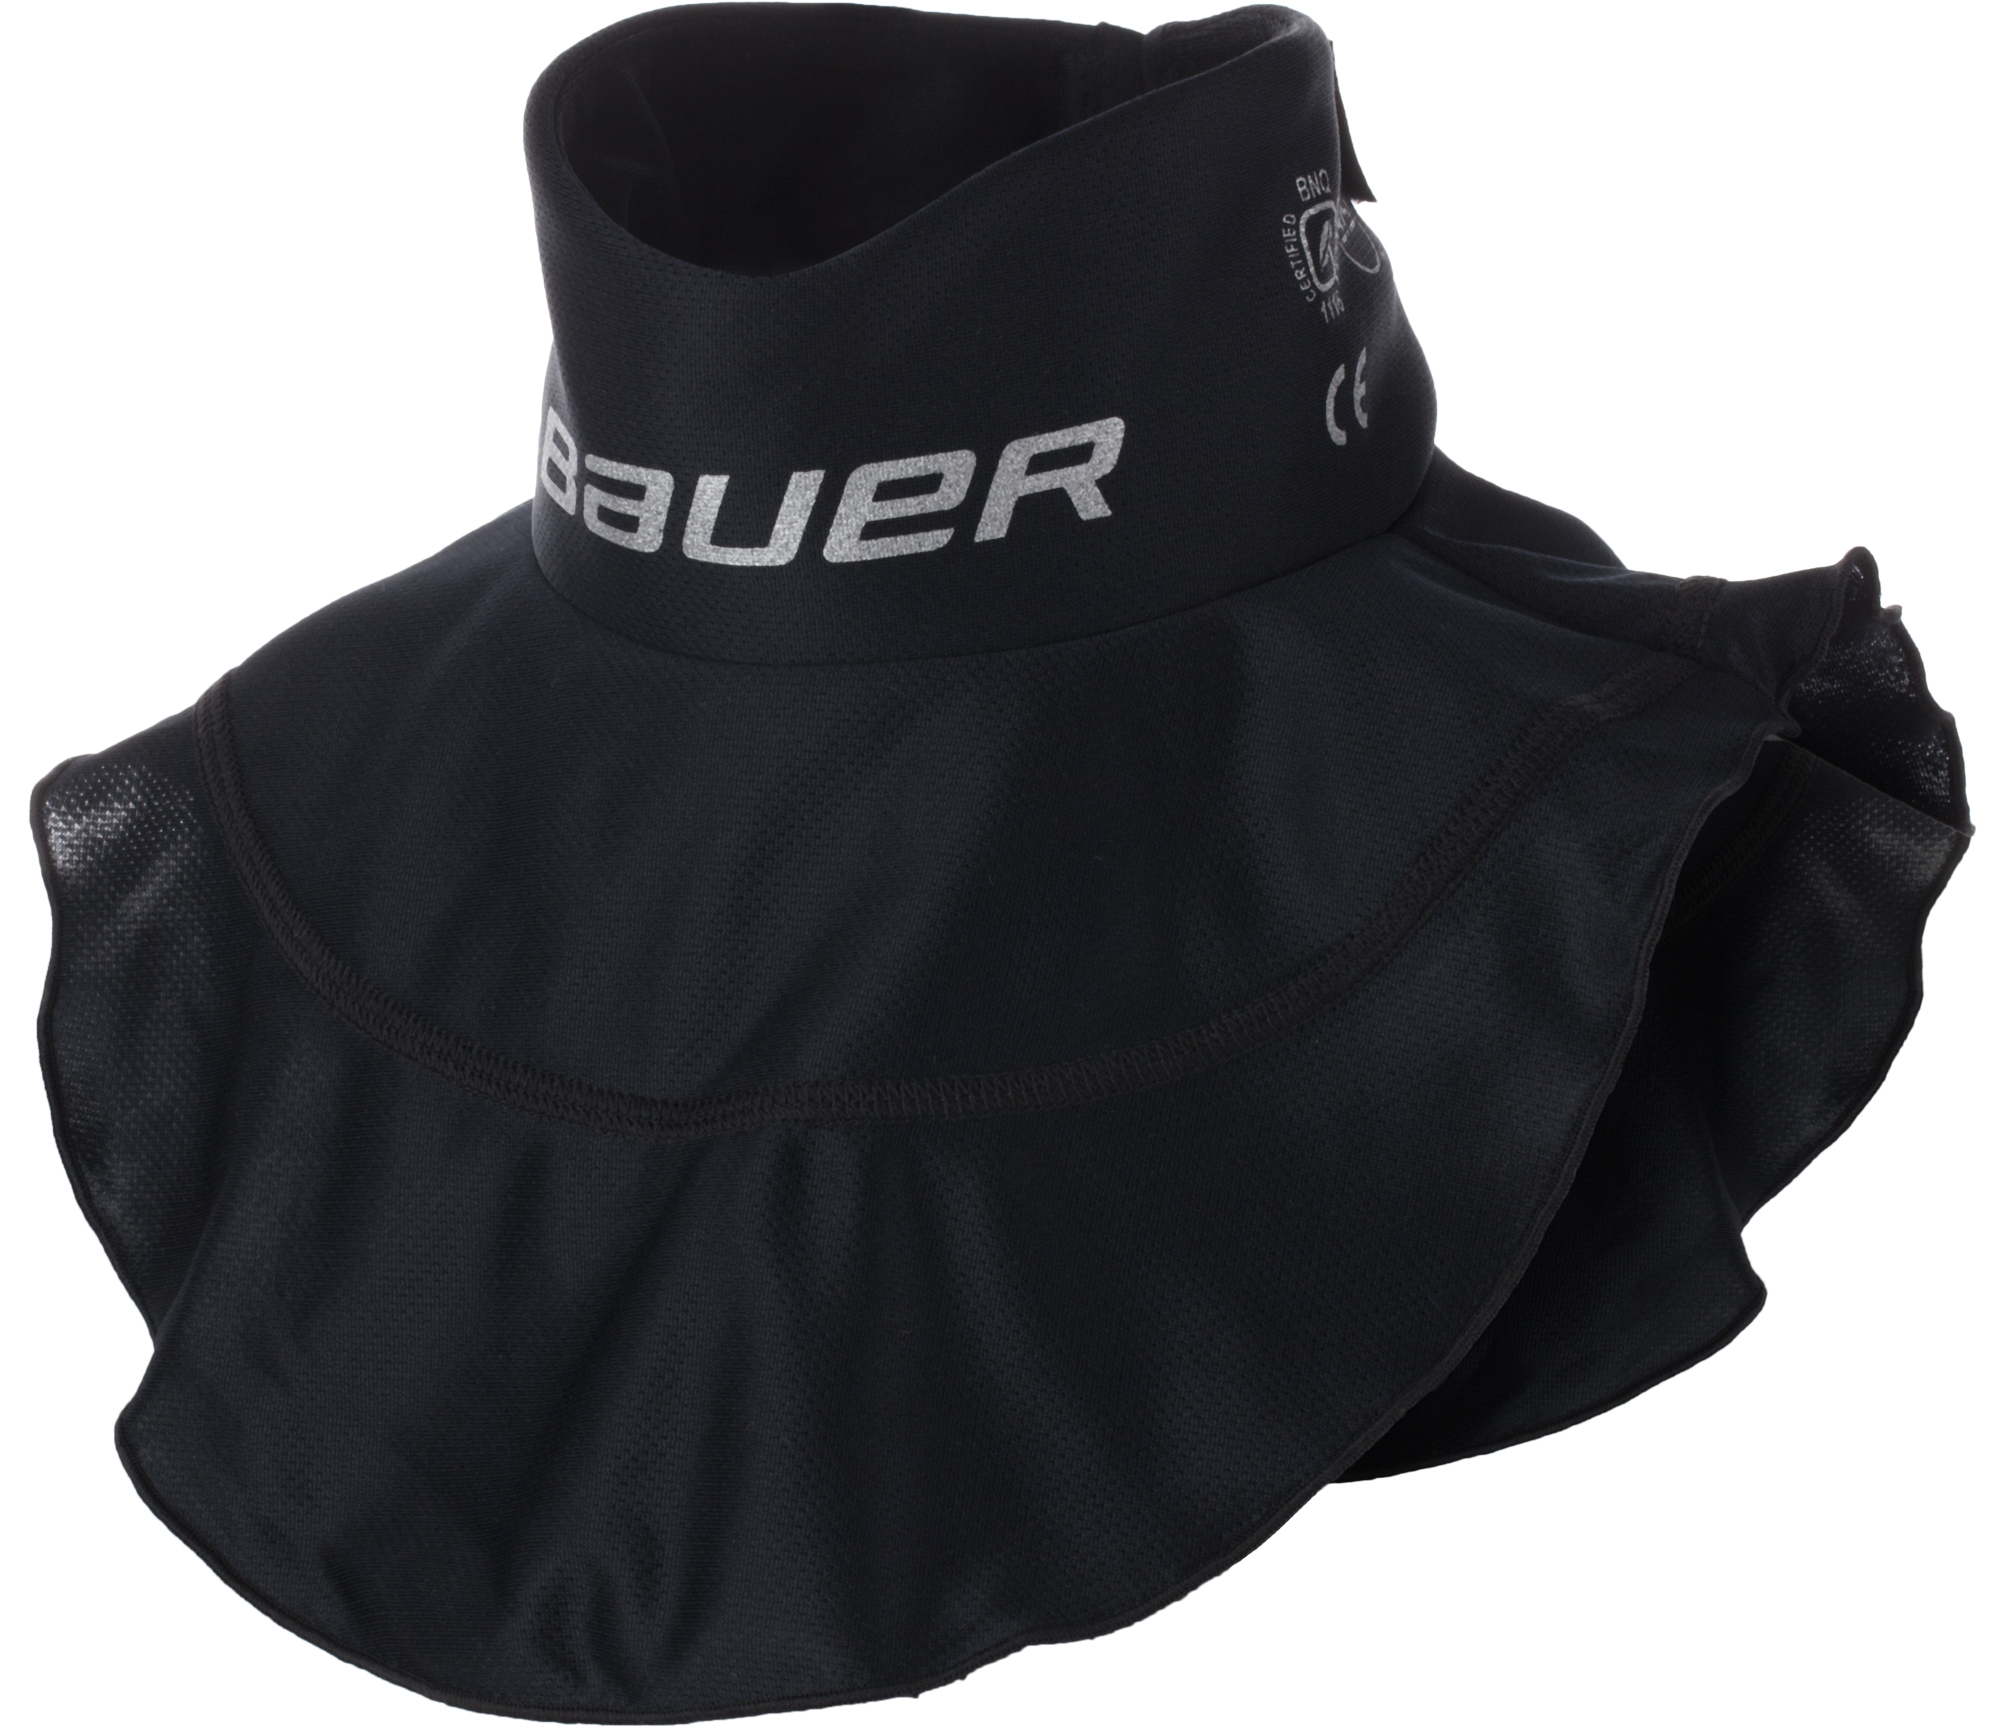 Bauer Защита шеи Bauer